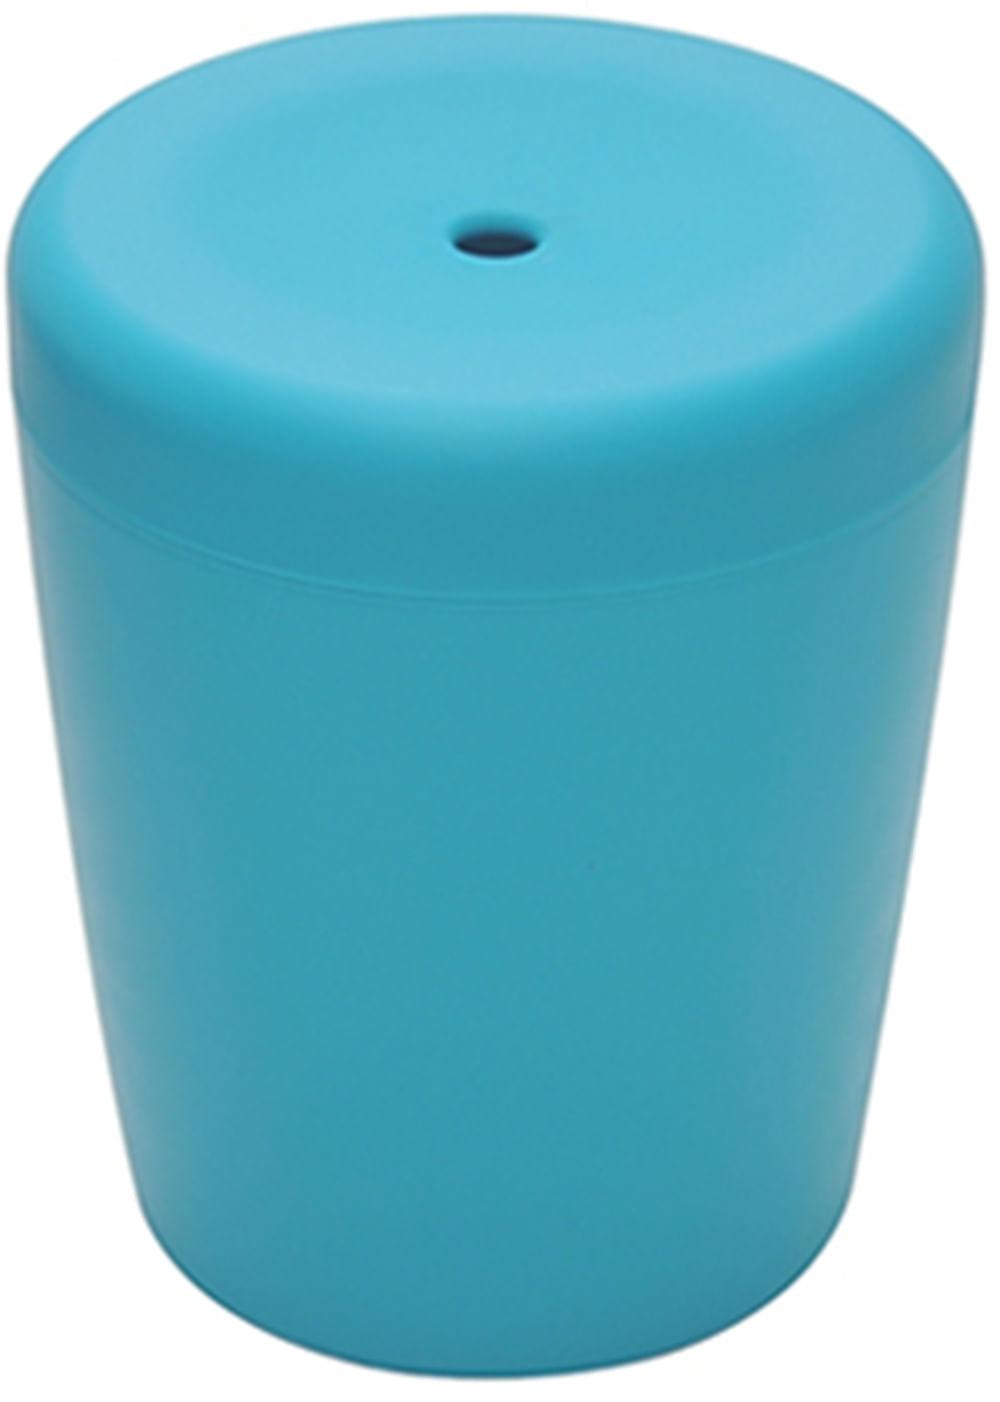 Puff Multiuso Polipropileno Azul - 19544